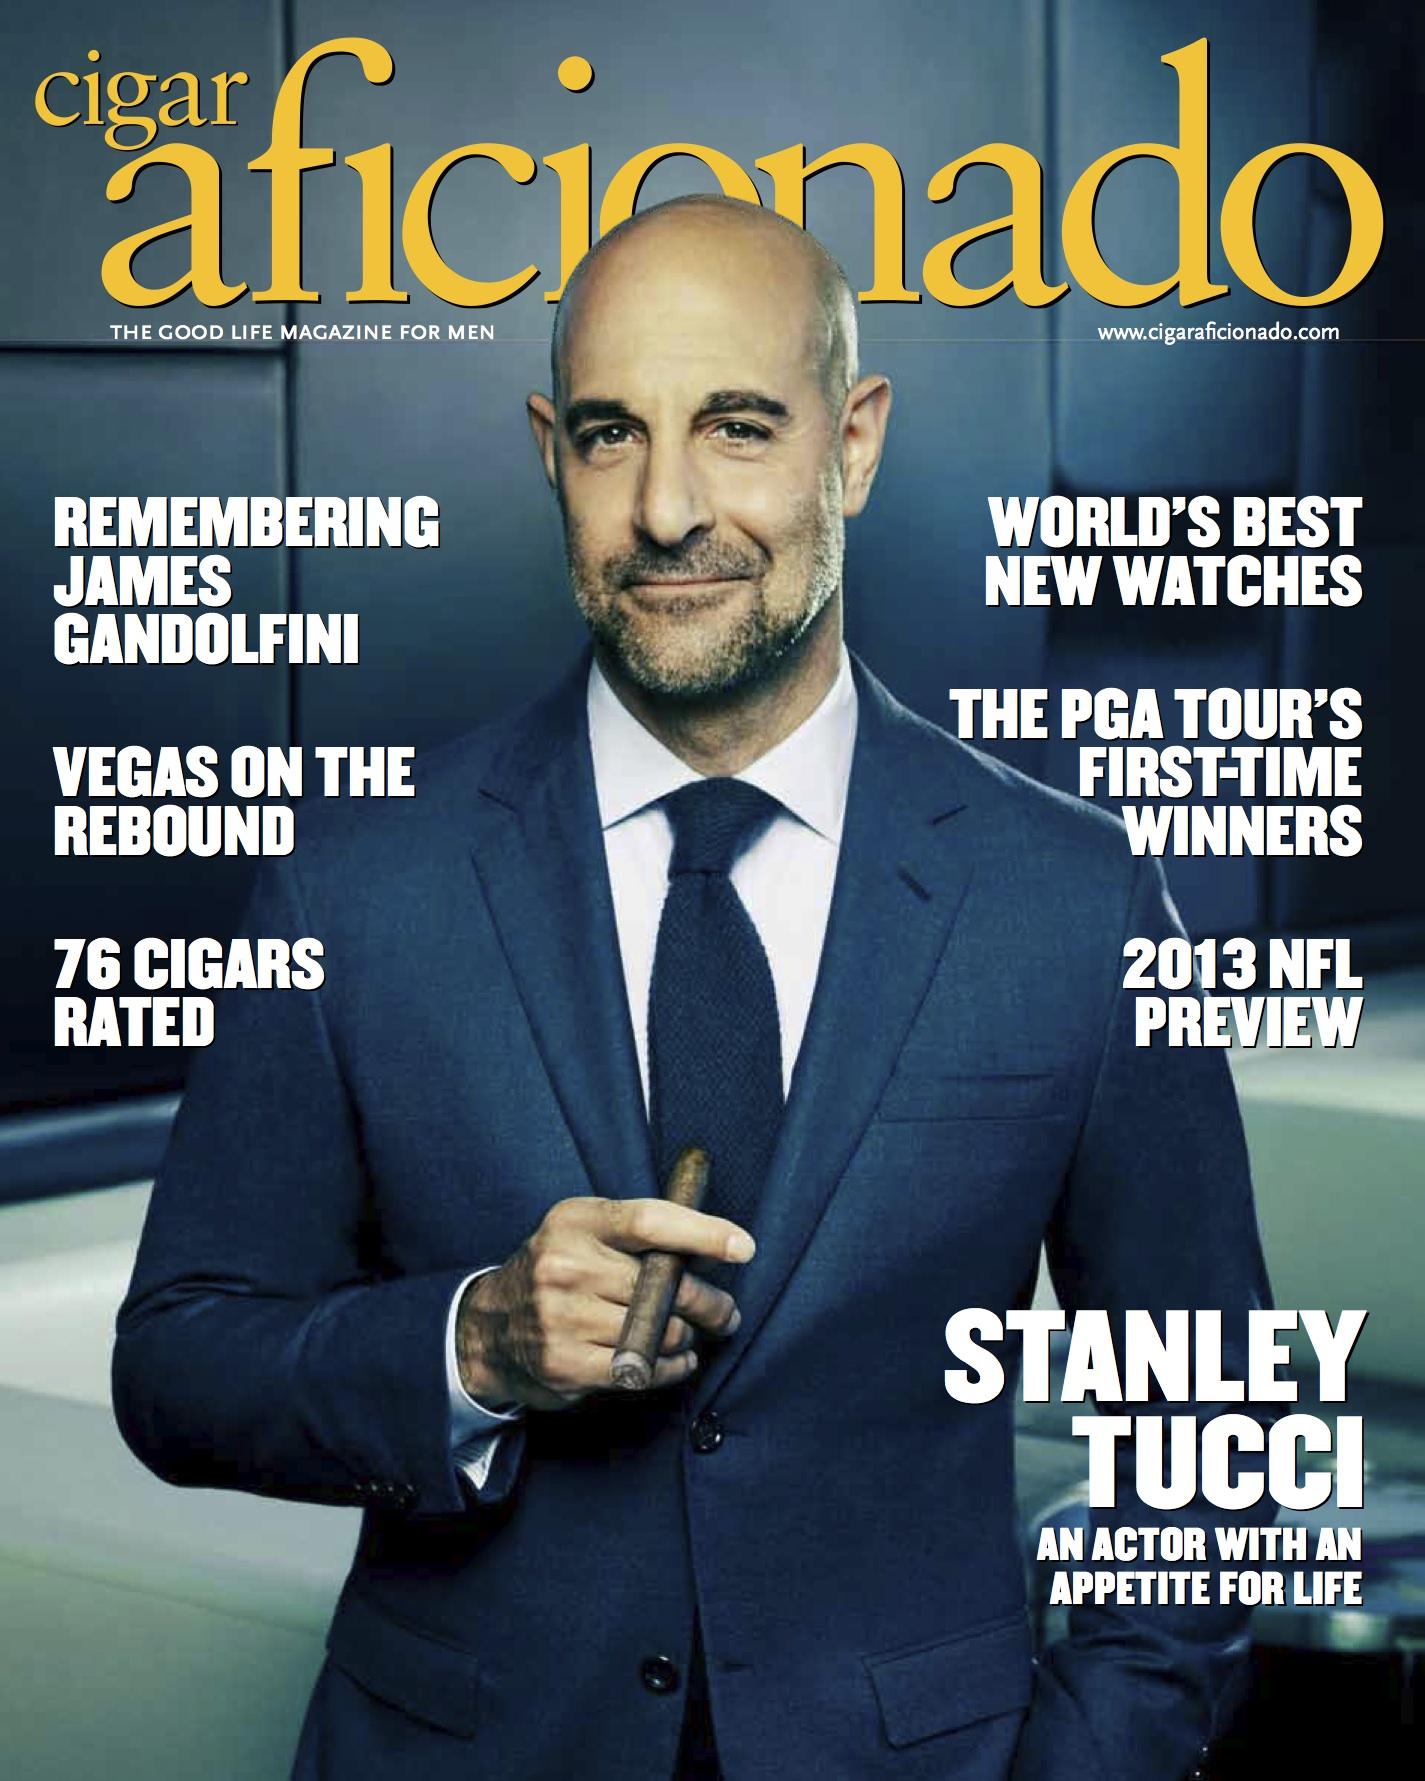 Congratulate, stanley tucci actor let's